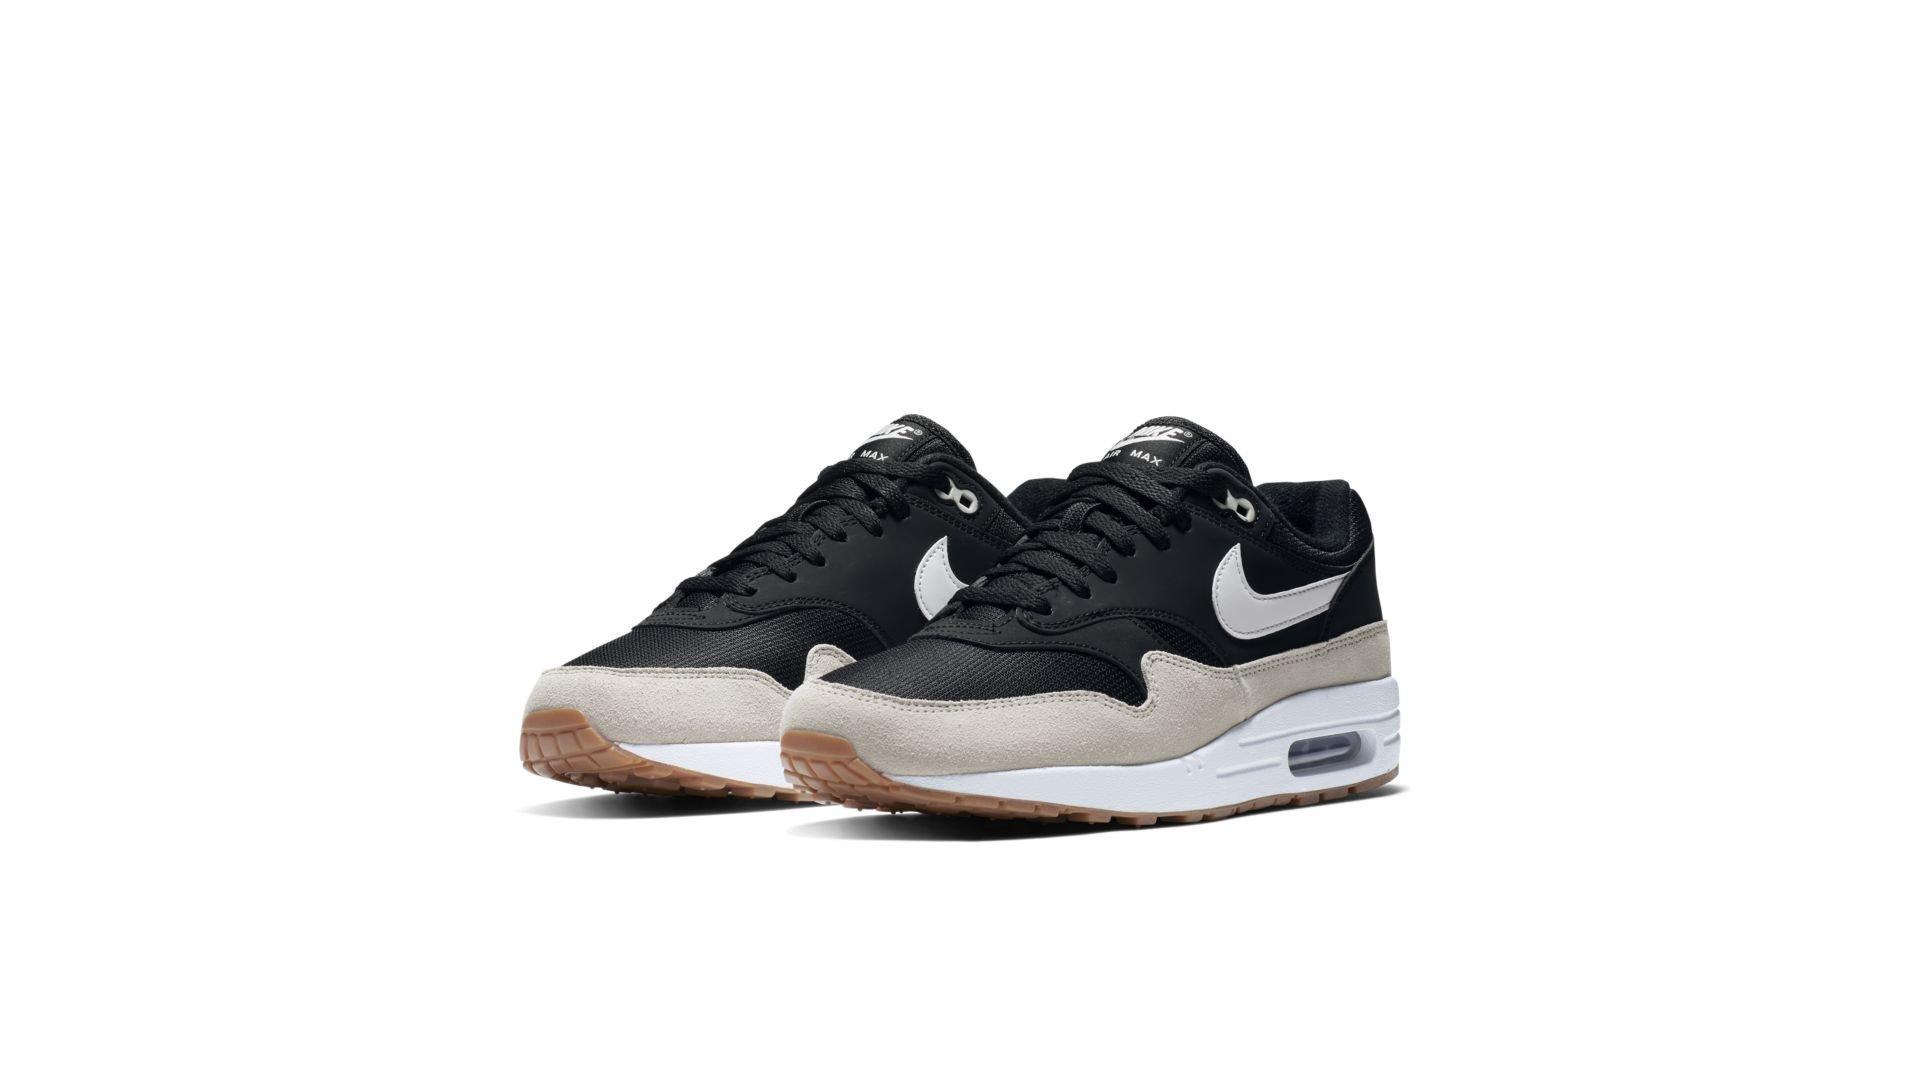 Nike Air Max 1 AH8145-009